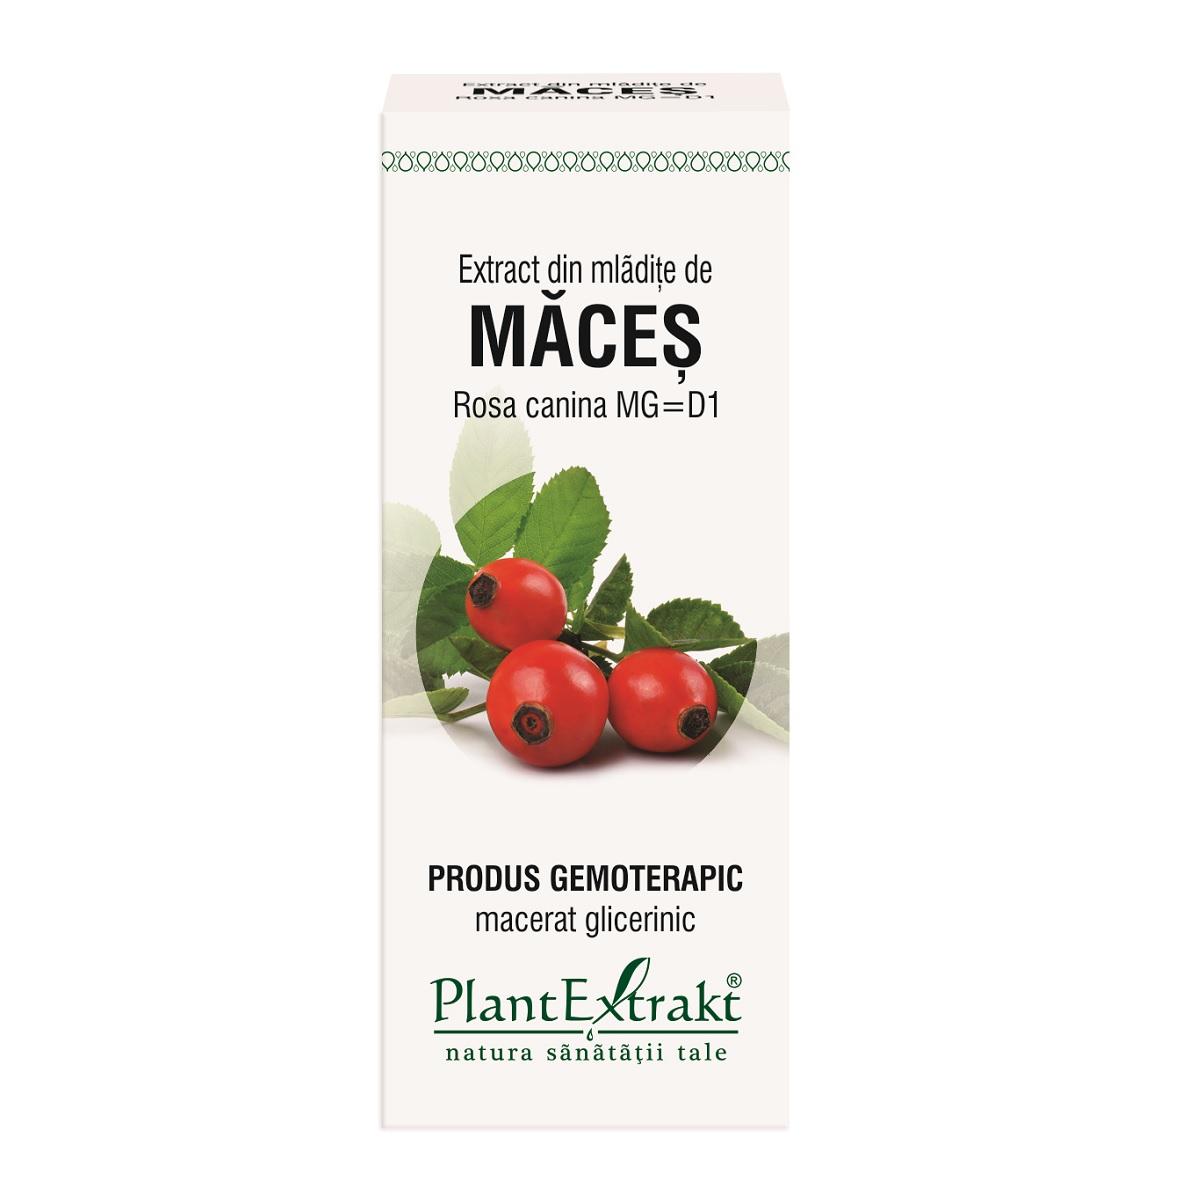 Extract din mlădite de Maceș, 50 ml, Plant Extract